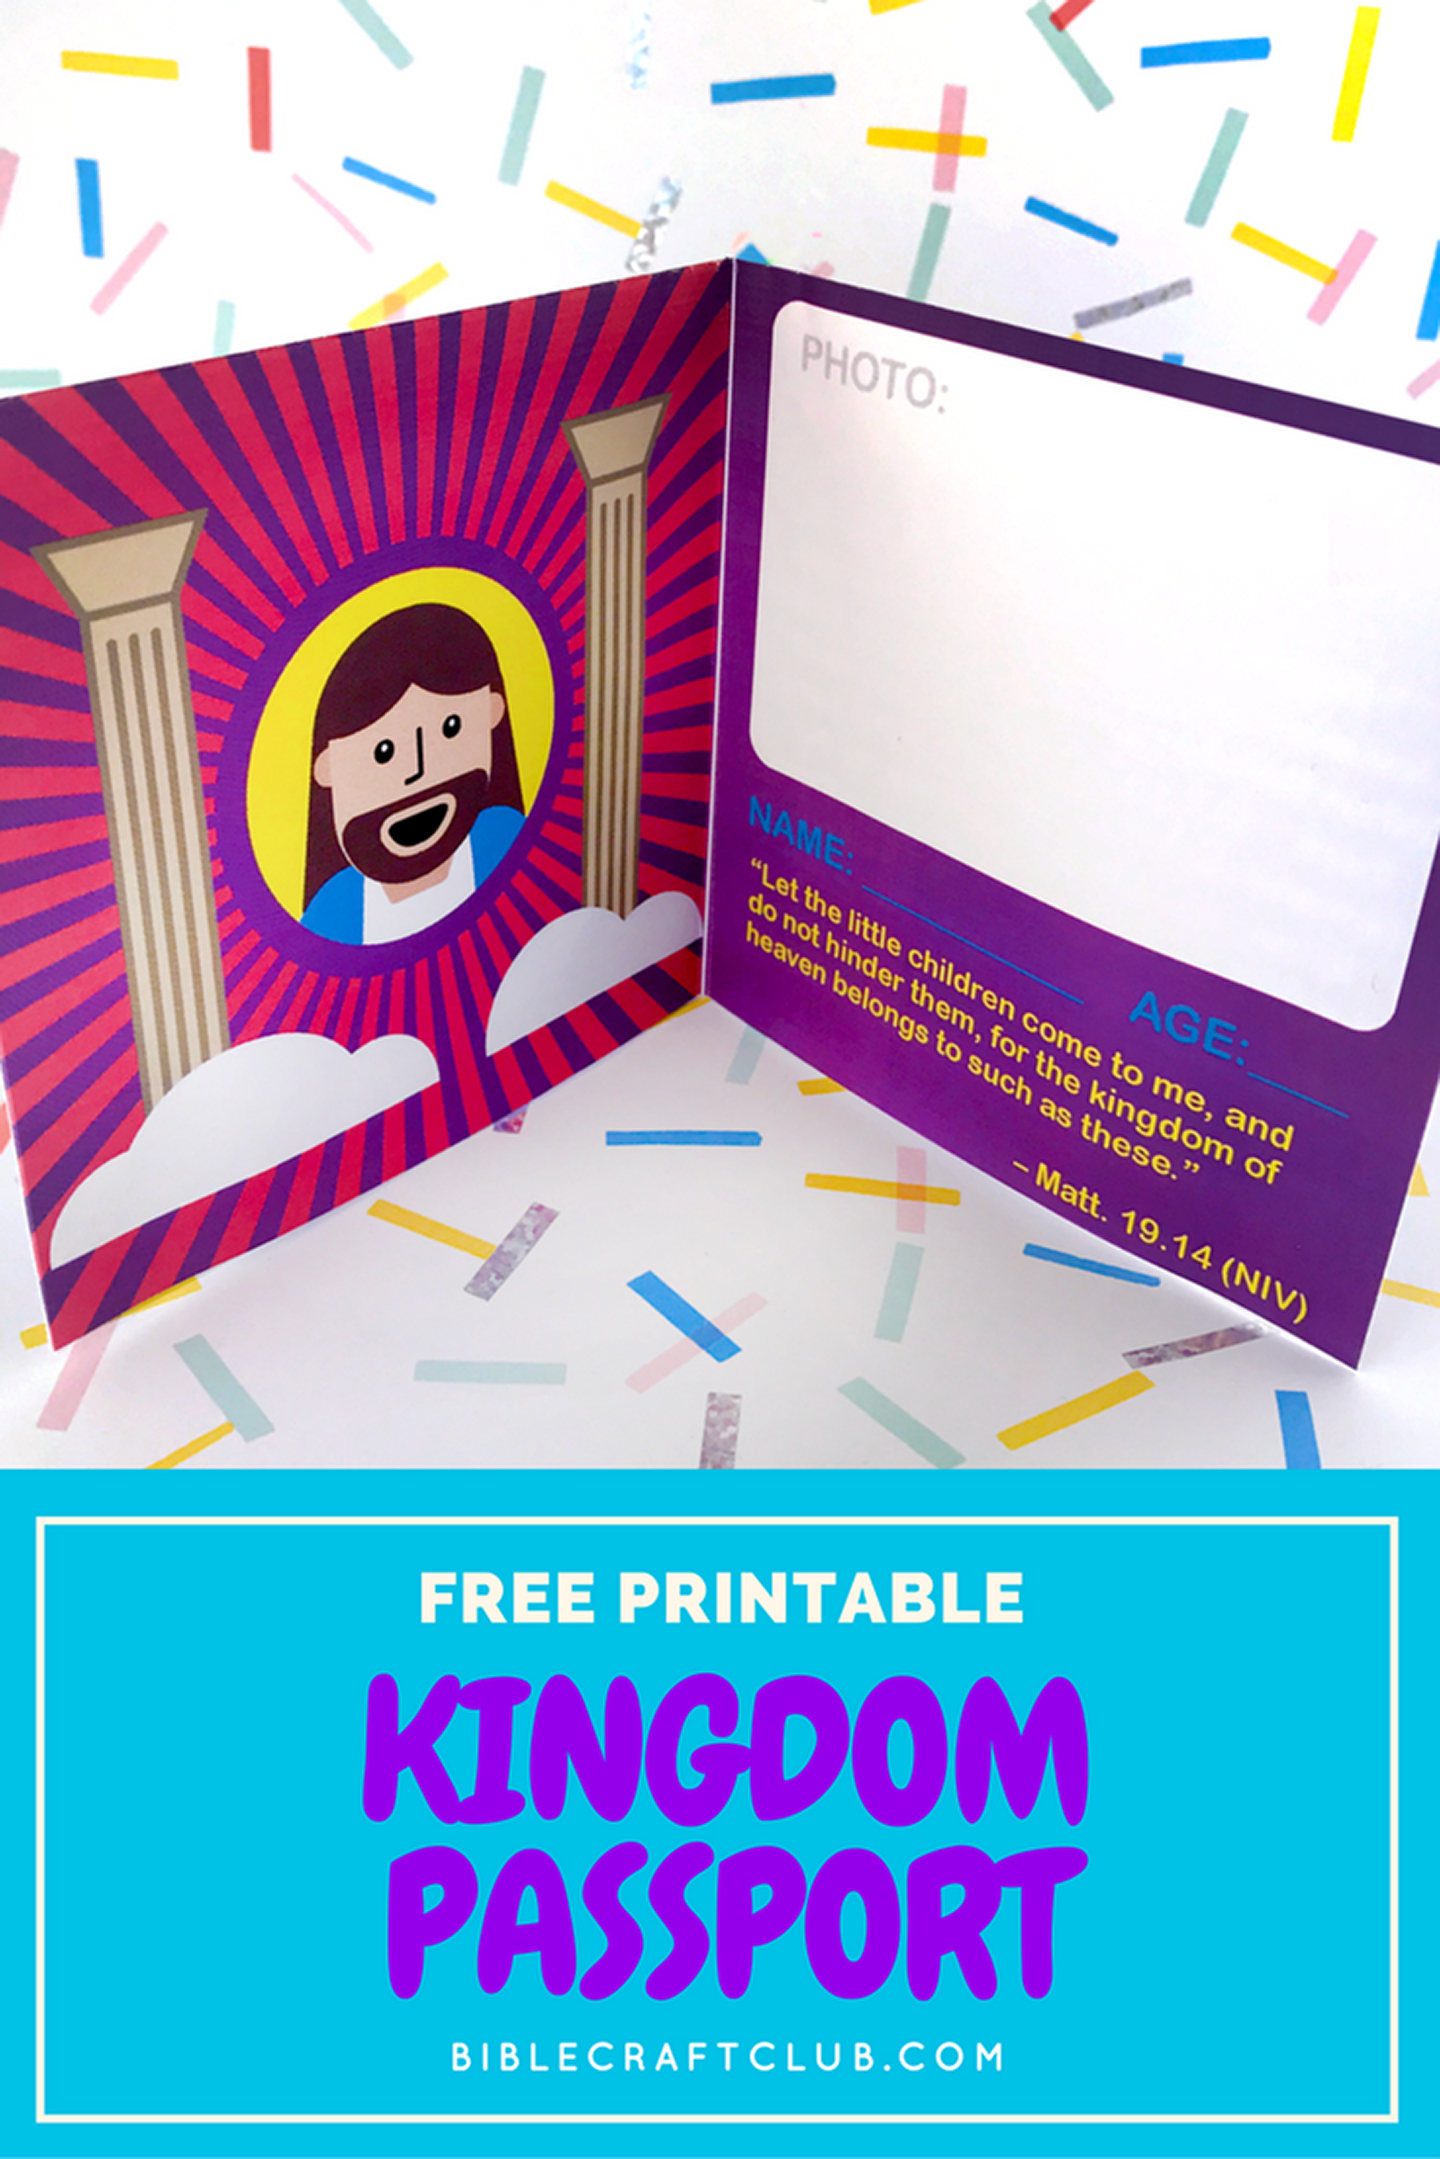 Kingdom Passport Craft | Biblecraftclub | Bible Crafts, Faith - Free Printable Bible Crafts